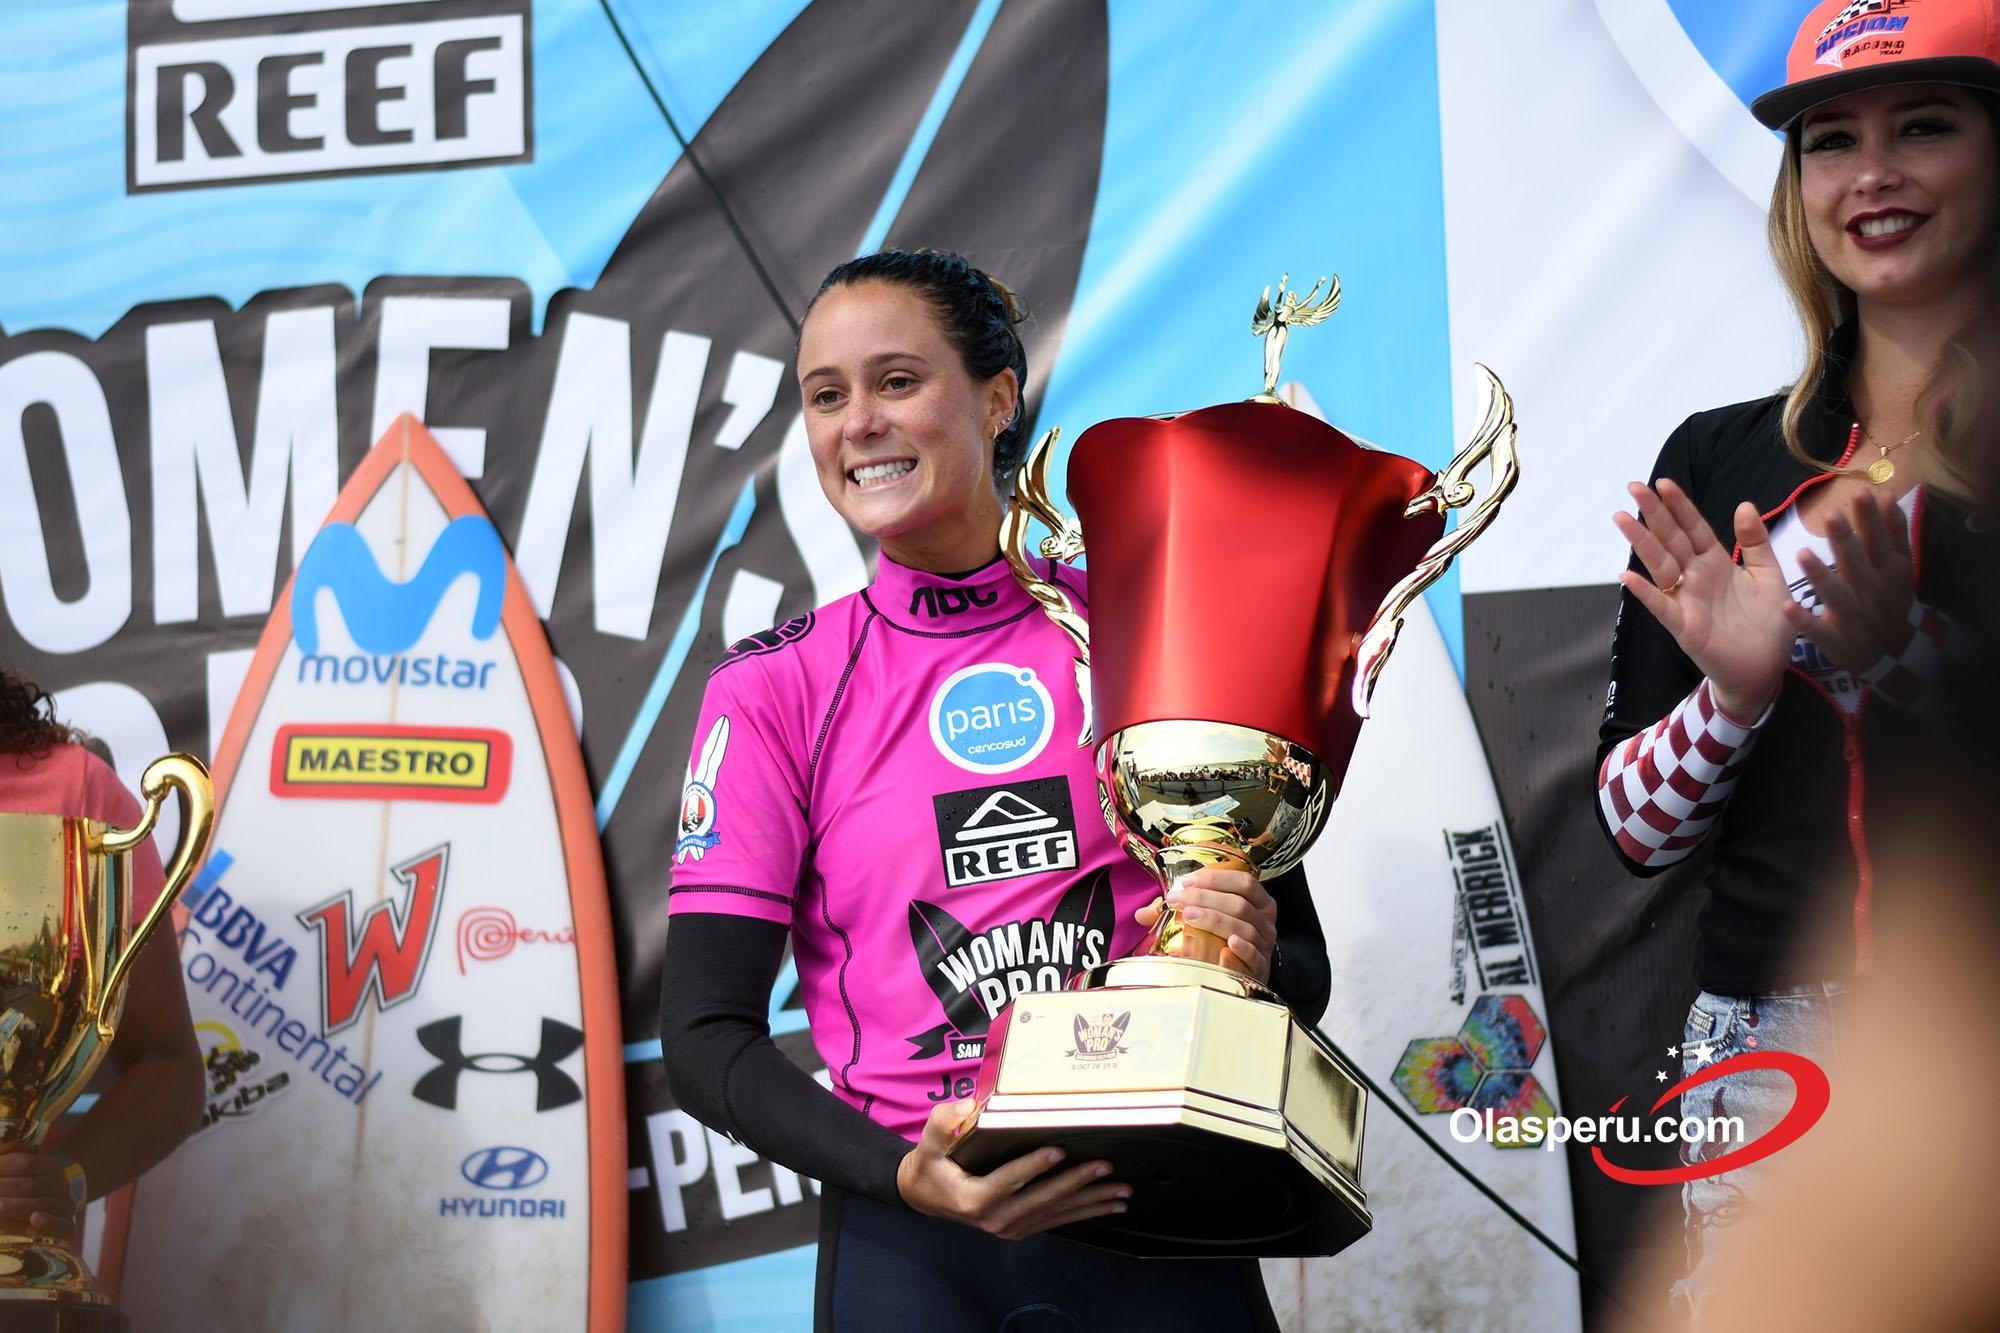 París Reef Women's Pro 2017 - DÍA 1